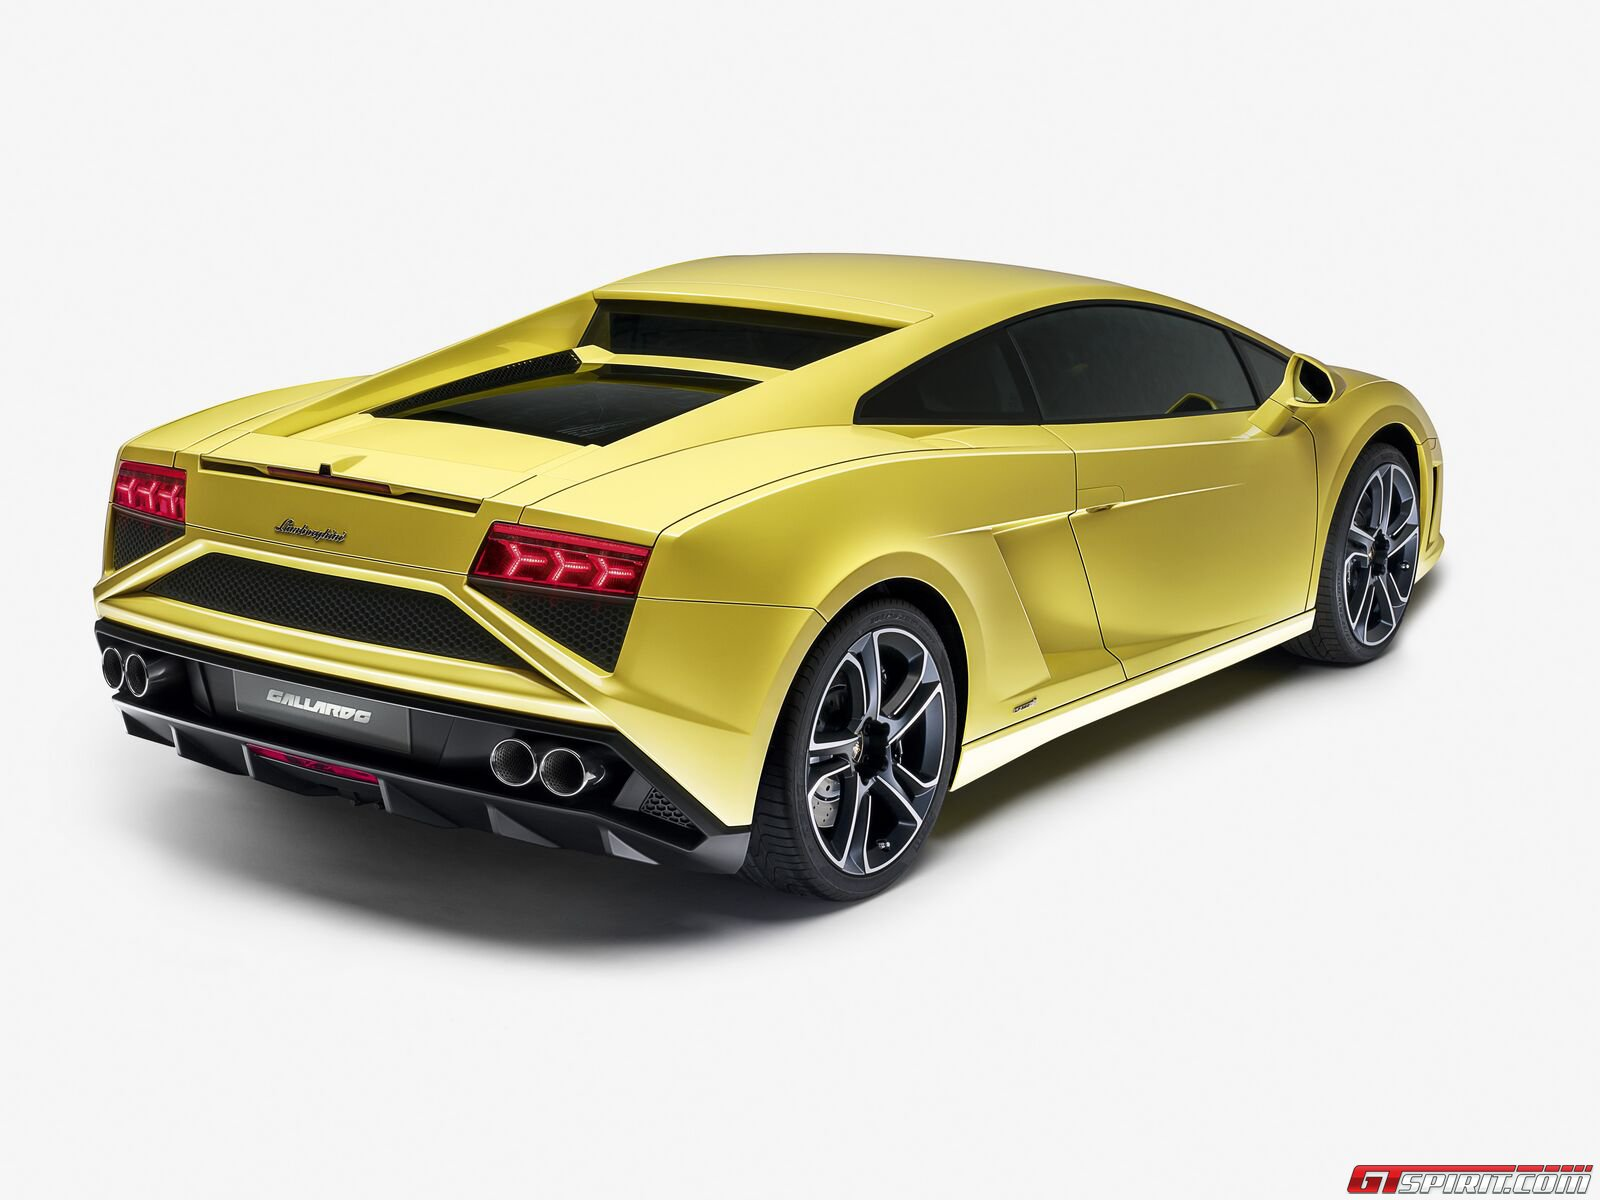 Lamborghini Gallardo LP560-4 Facelift Photo 2